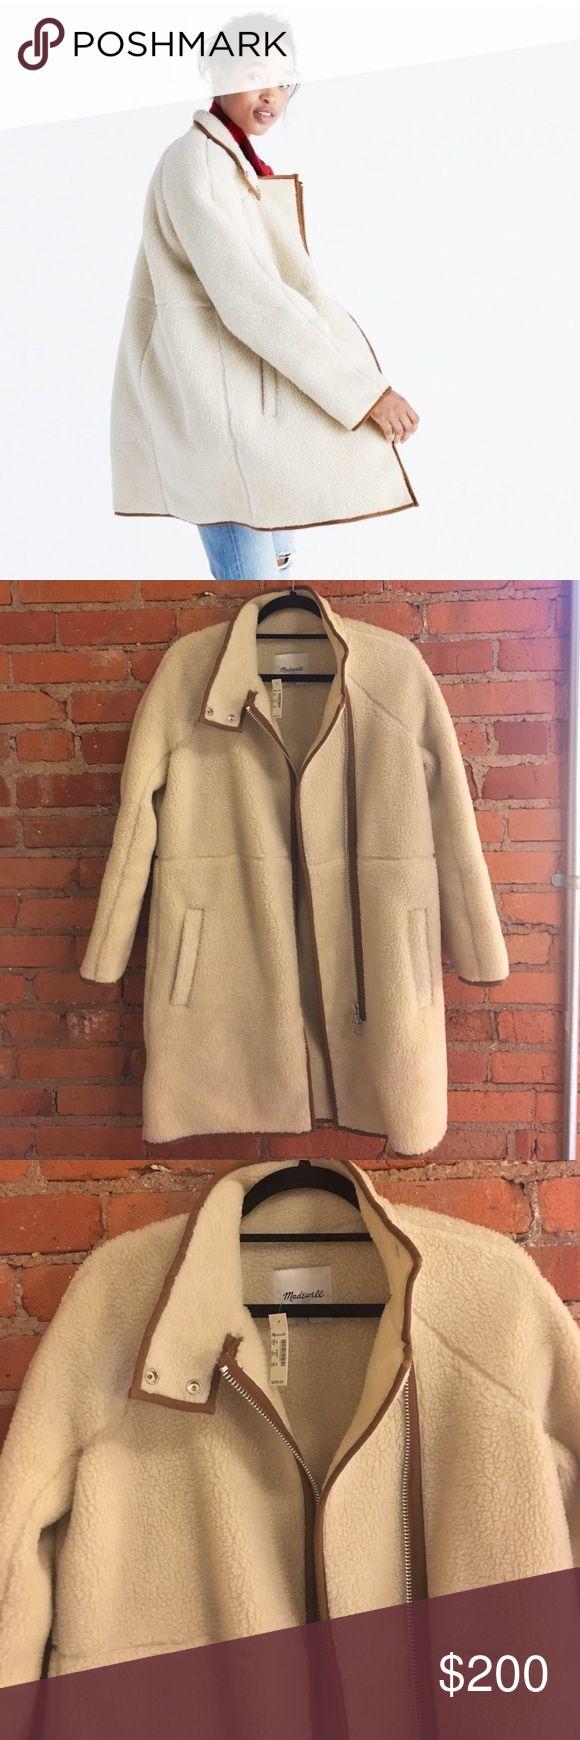 NWT Madewell Sherpa cocoon coat size XS New with tags. Madewell Sherpa cocoon coat size XS Madewell Jackets & Coats